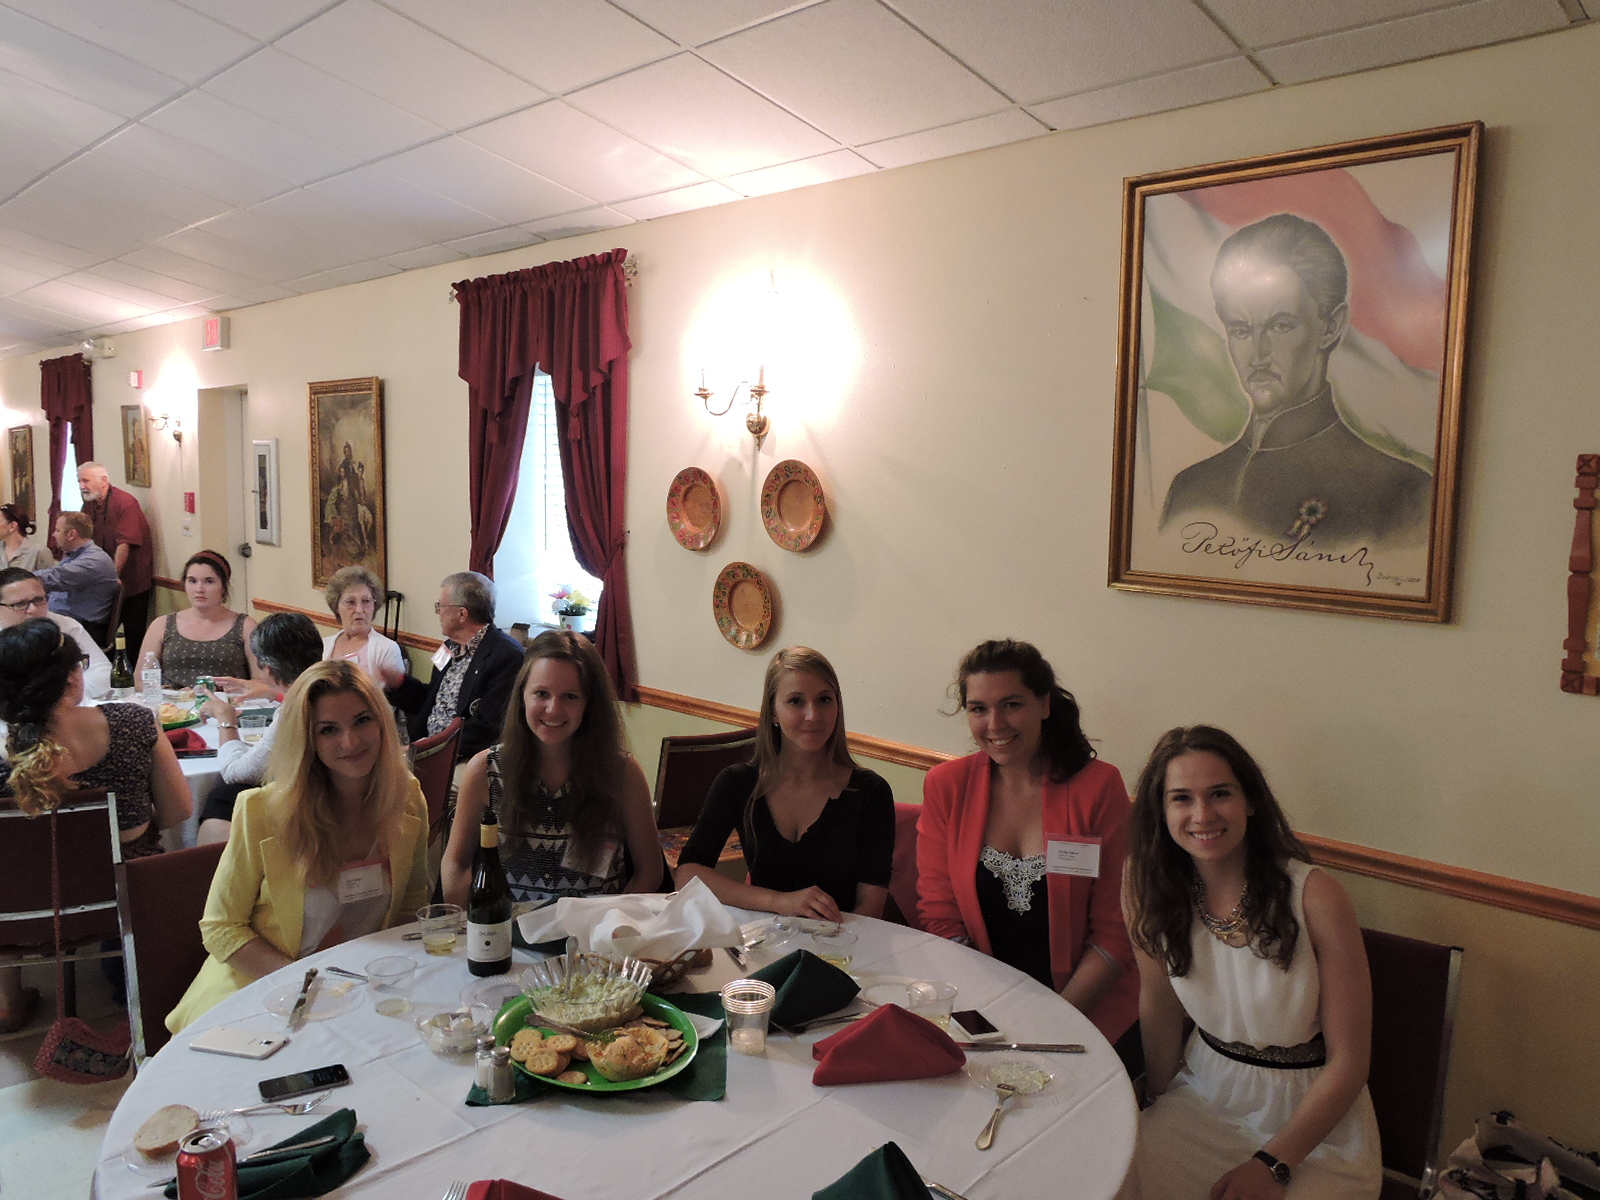 Ms. Faye Gillespie from Boston, MA and Coalition interns Ms. Veronika Tóth, Ms. Anett Matkó, Ms. Zsófia Anna Tábori and Ms. Enikő Horváth